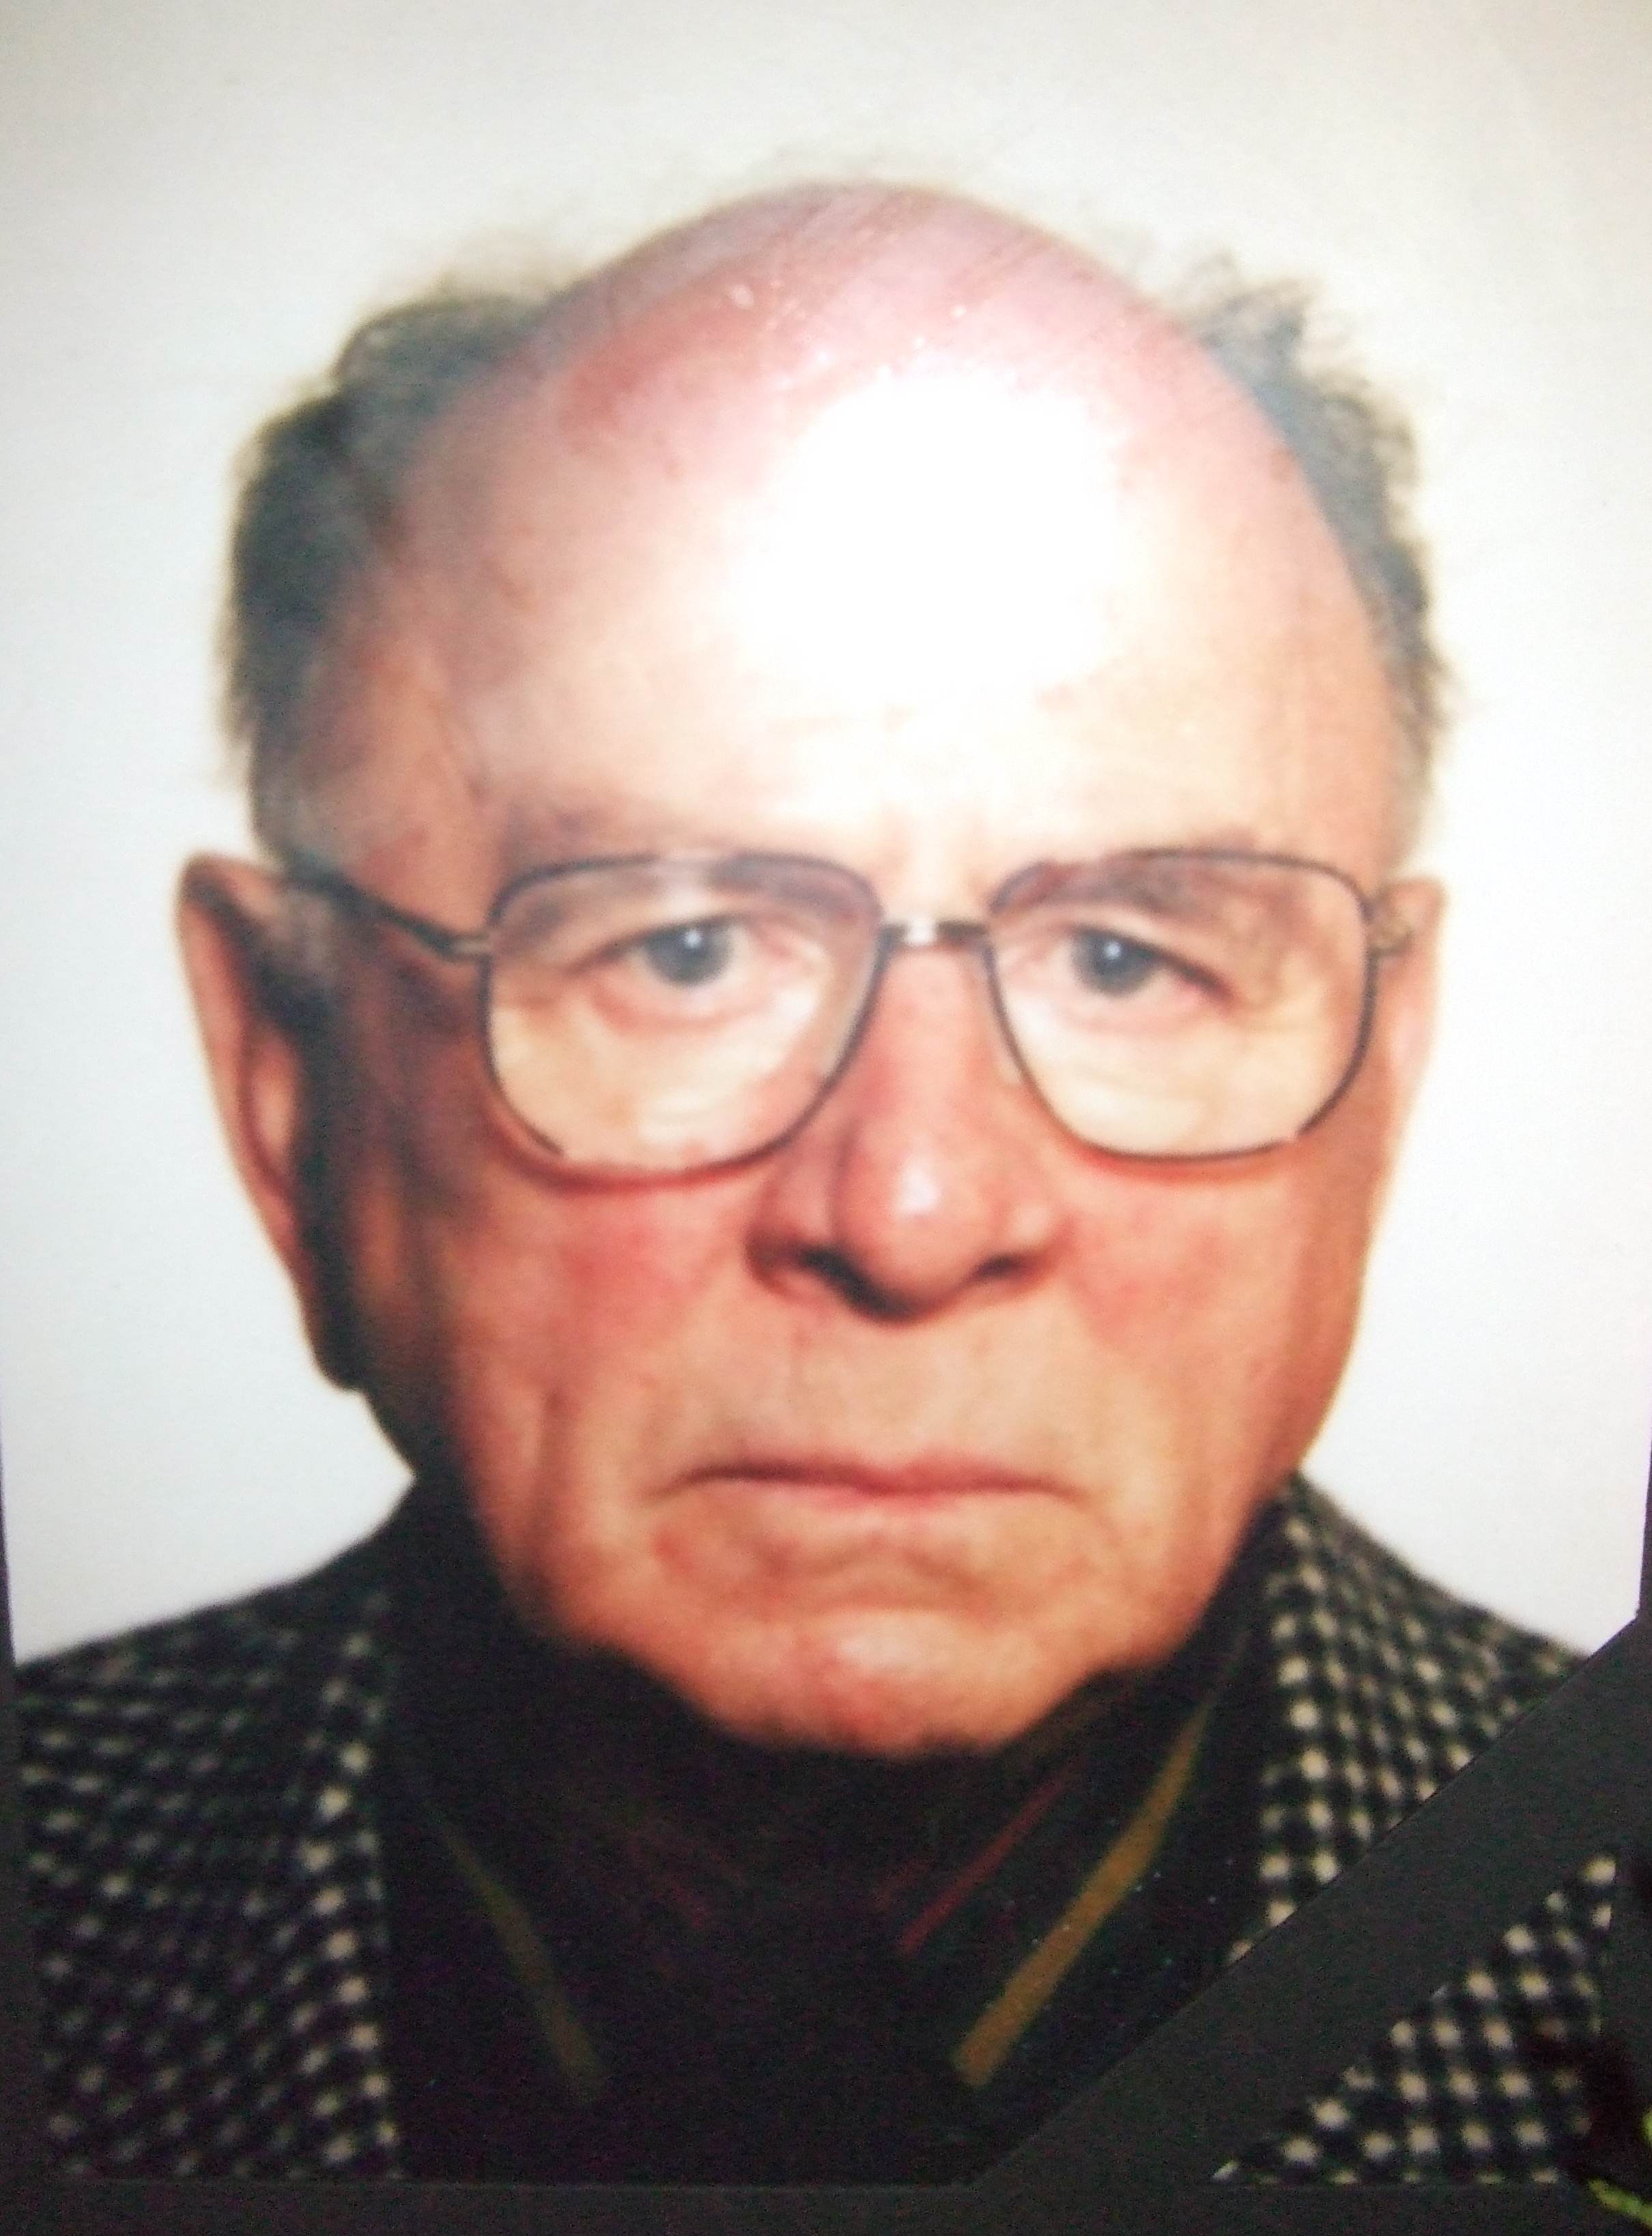 Anton Fijauz